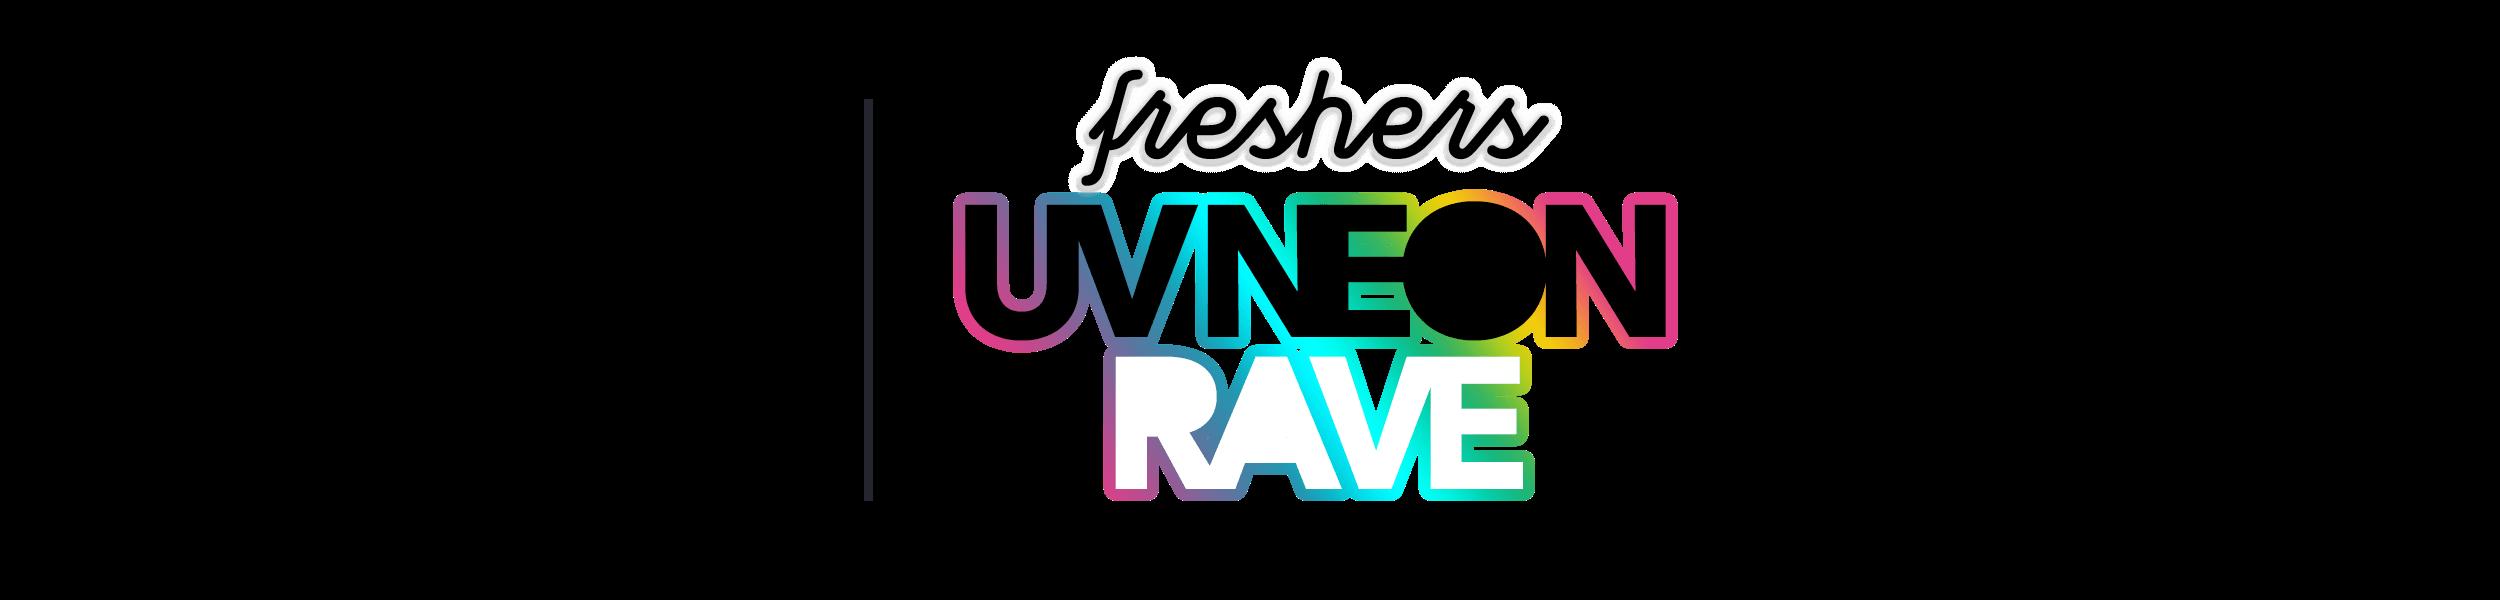 Freshers Life | Freshers UV Neon Rave - Freshers ZOO - Battle of the Universities - Freshers Moving in Party - Welcome week Freshers Wristband